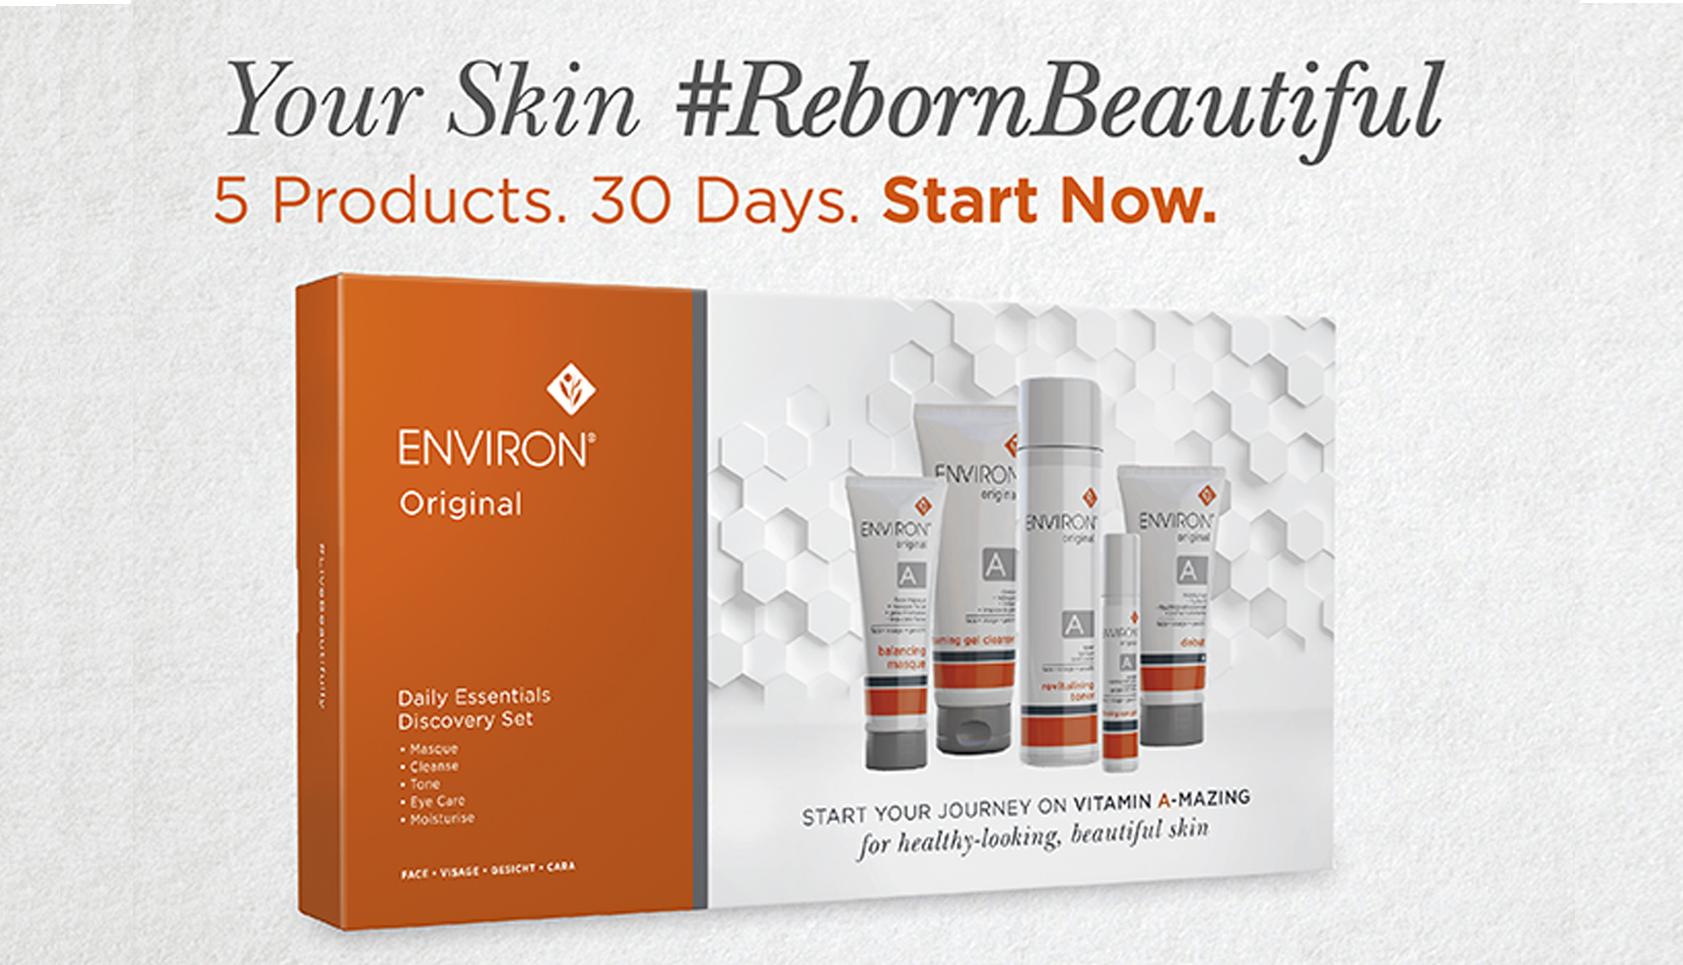 Bring your skin back to beautiful - Original Discovery - Promo - hero - Environ Skin Care